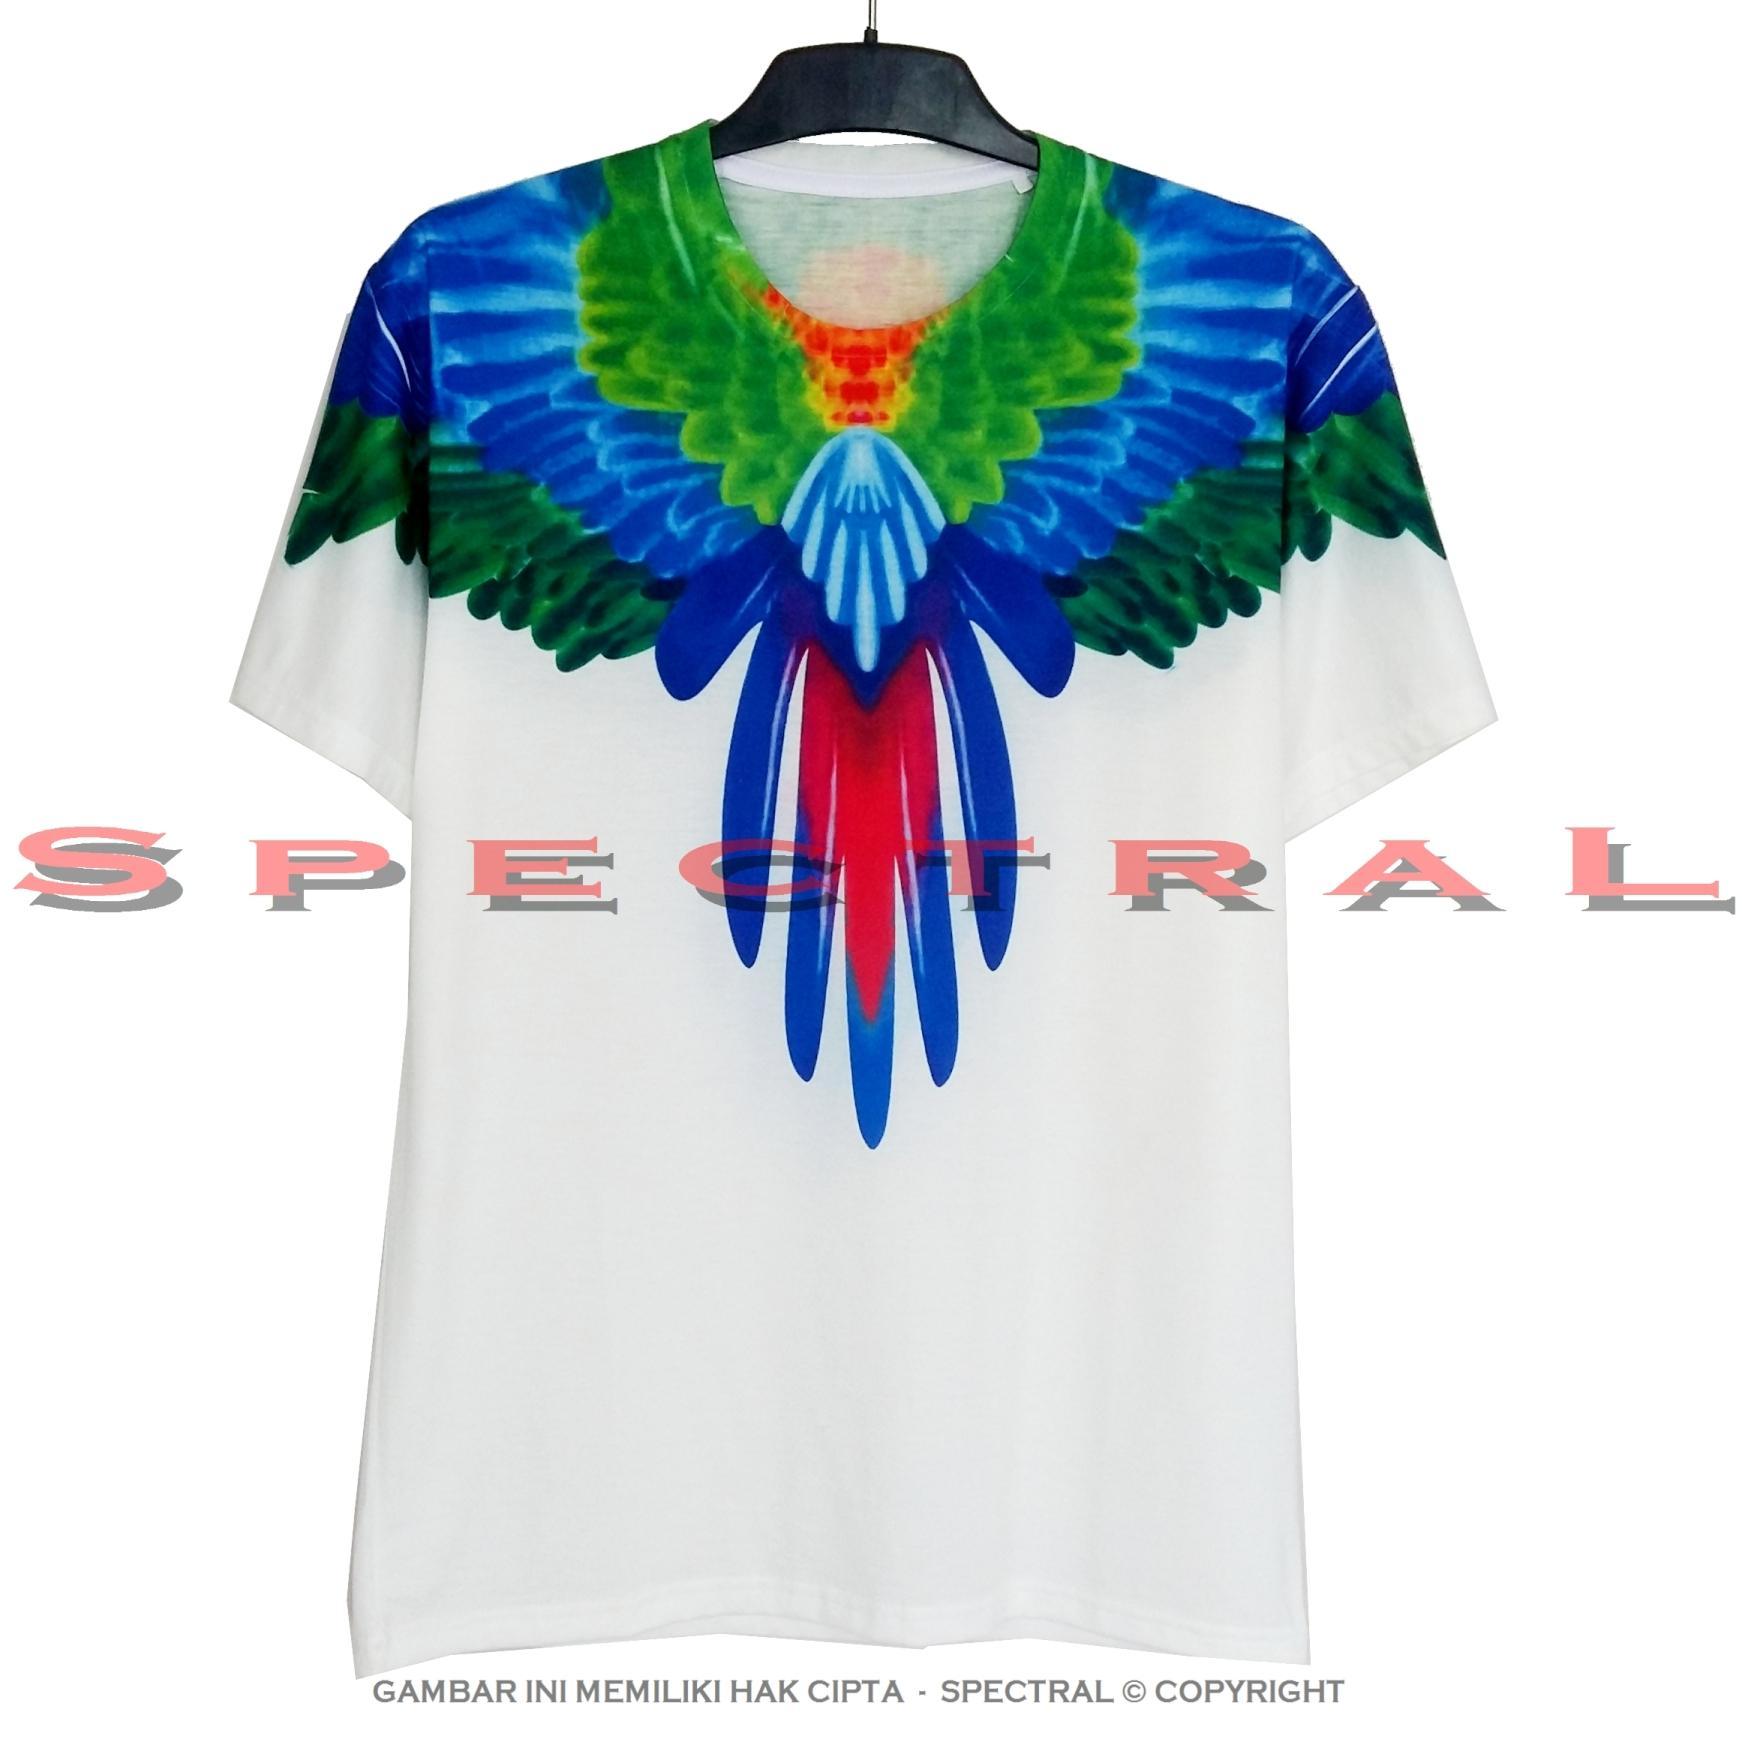 Spectral - SAYAP BIRU PRINTING 100% Soft Cotton Combed 30s Kaos Distro .